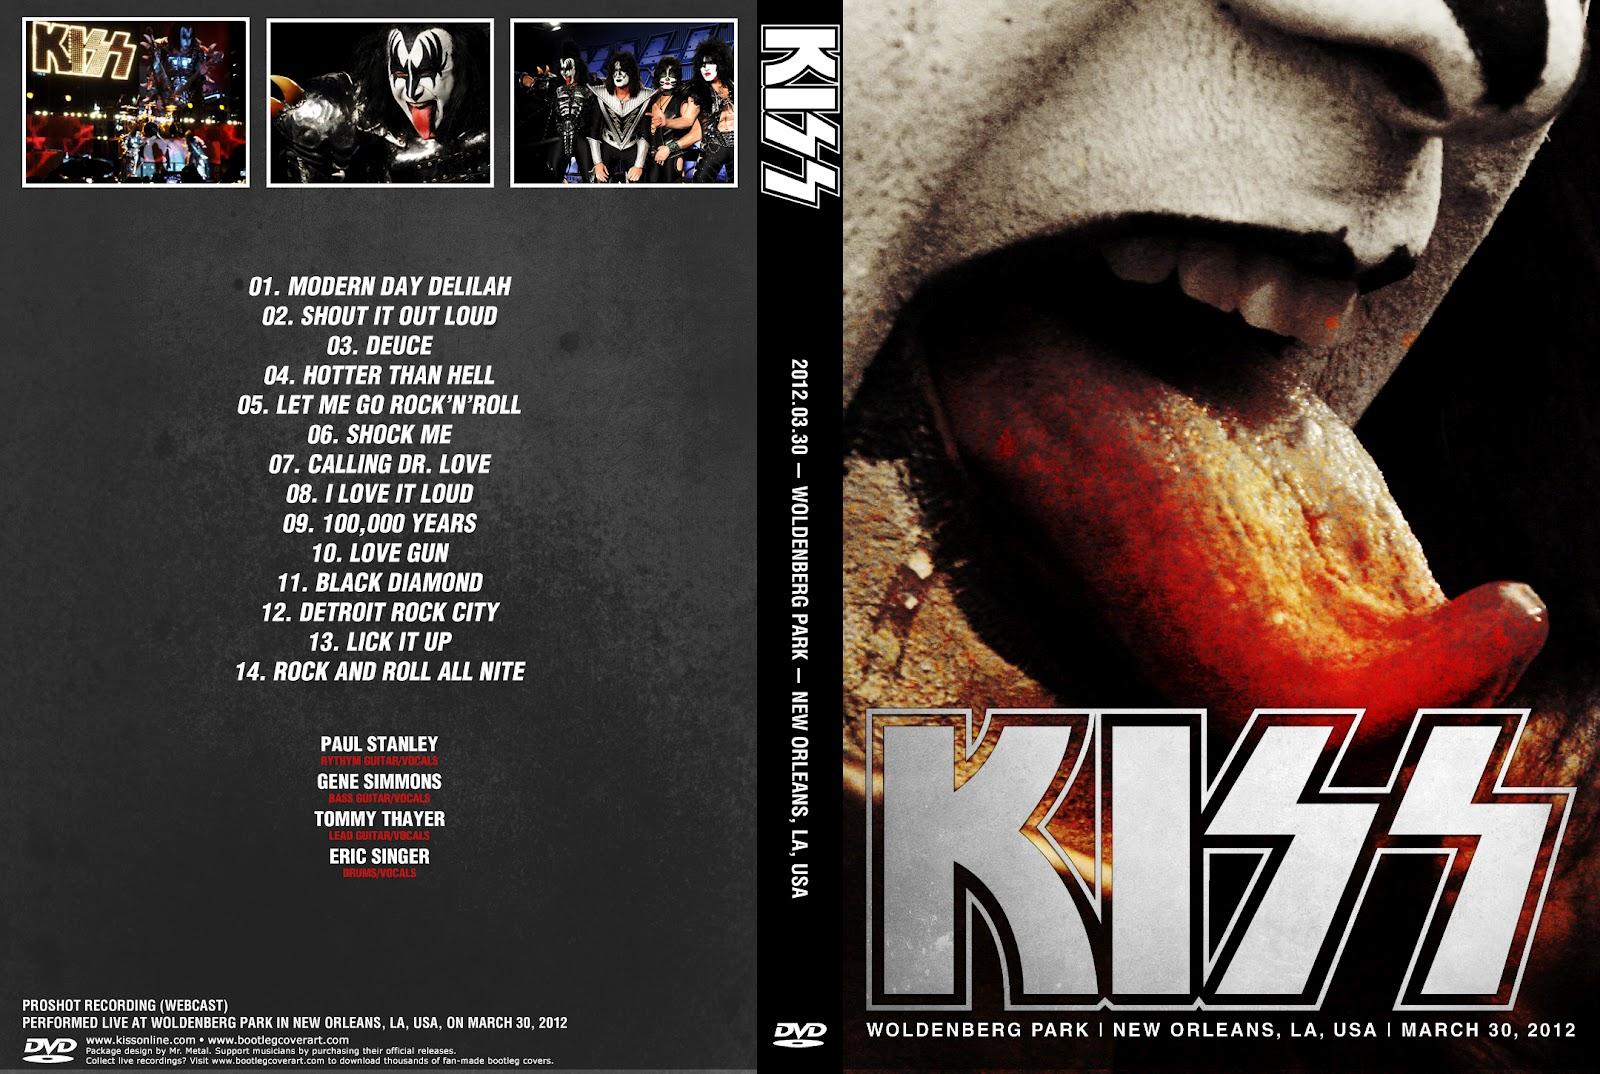 http://4.bp.blogspot.com/-1ZYxkXNdjMw/T8KW8yXWmRI/AAAAAAAAPS0/R_tpXFPyEbI/s1600/KISS_2012-03-30_NewOrleansLA_DVD_1cover.jpg